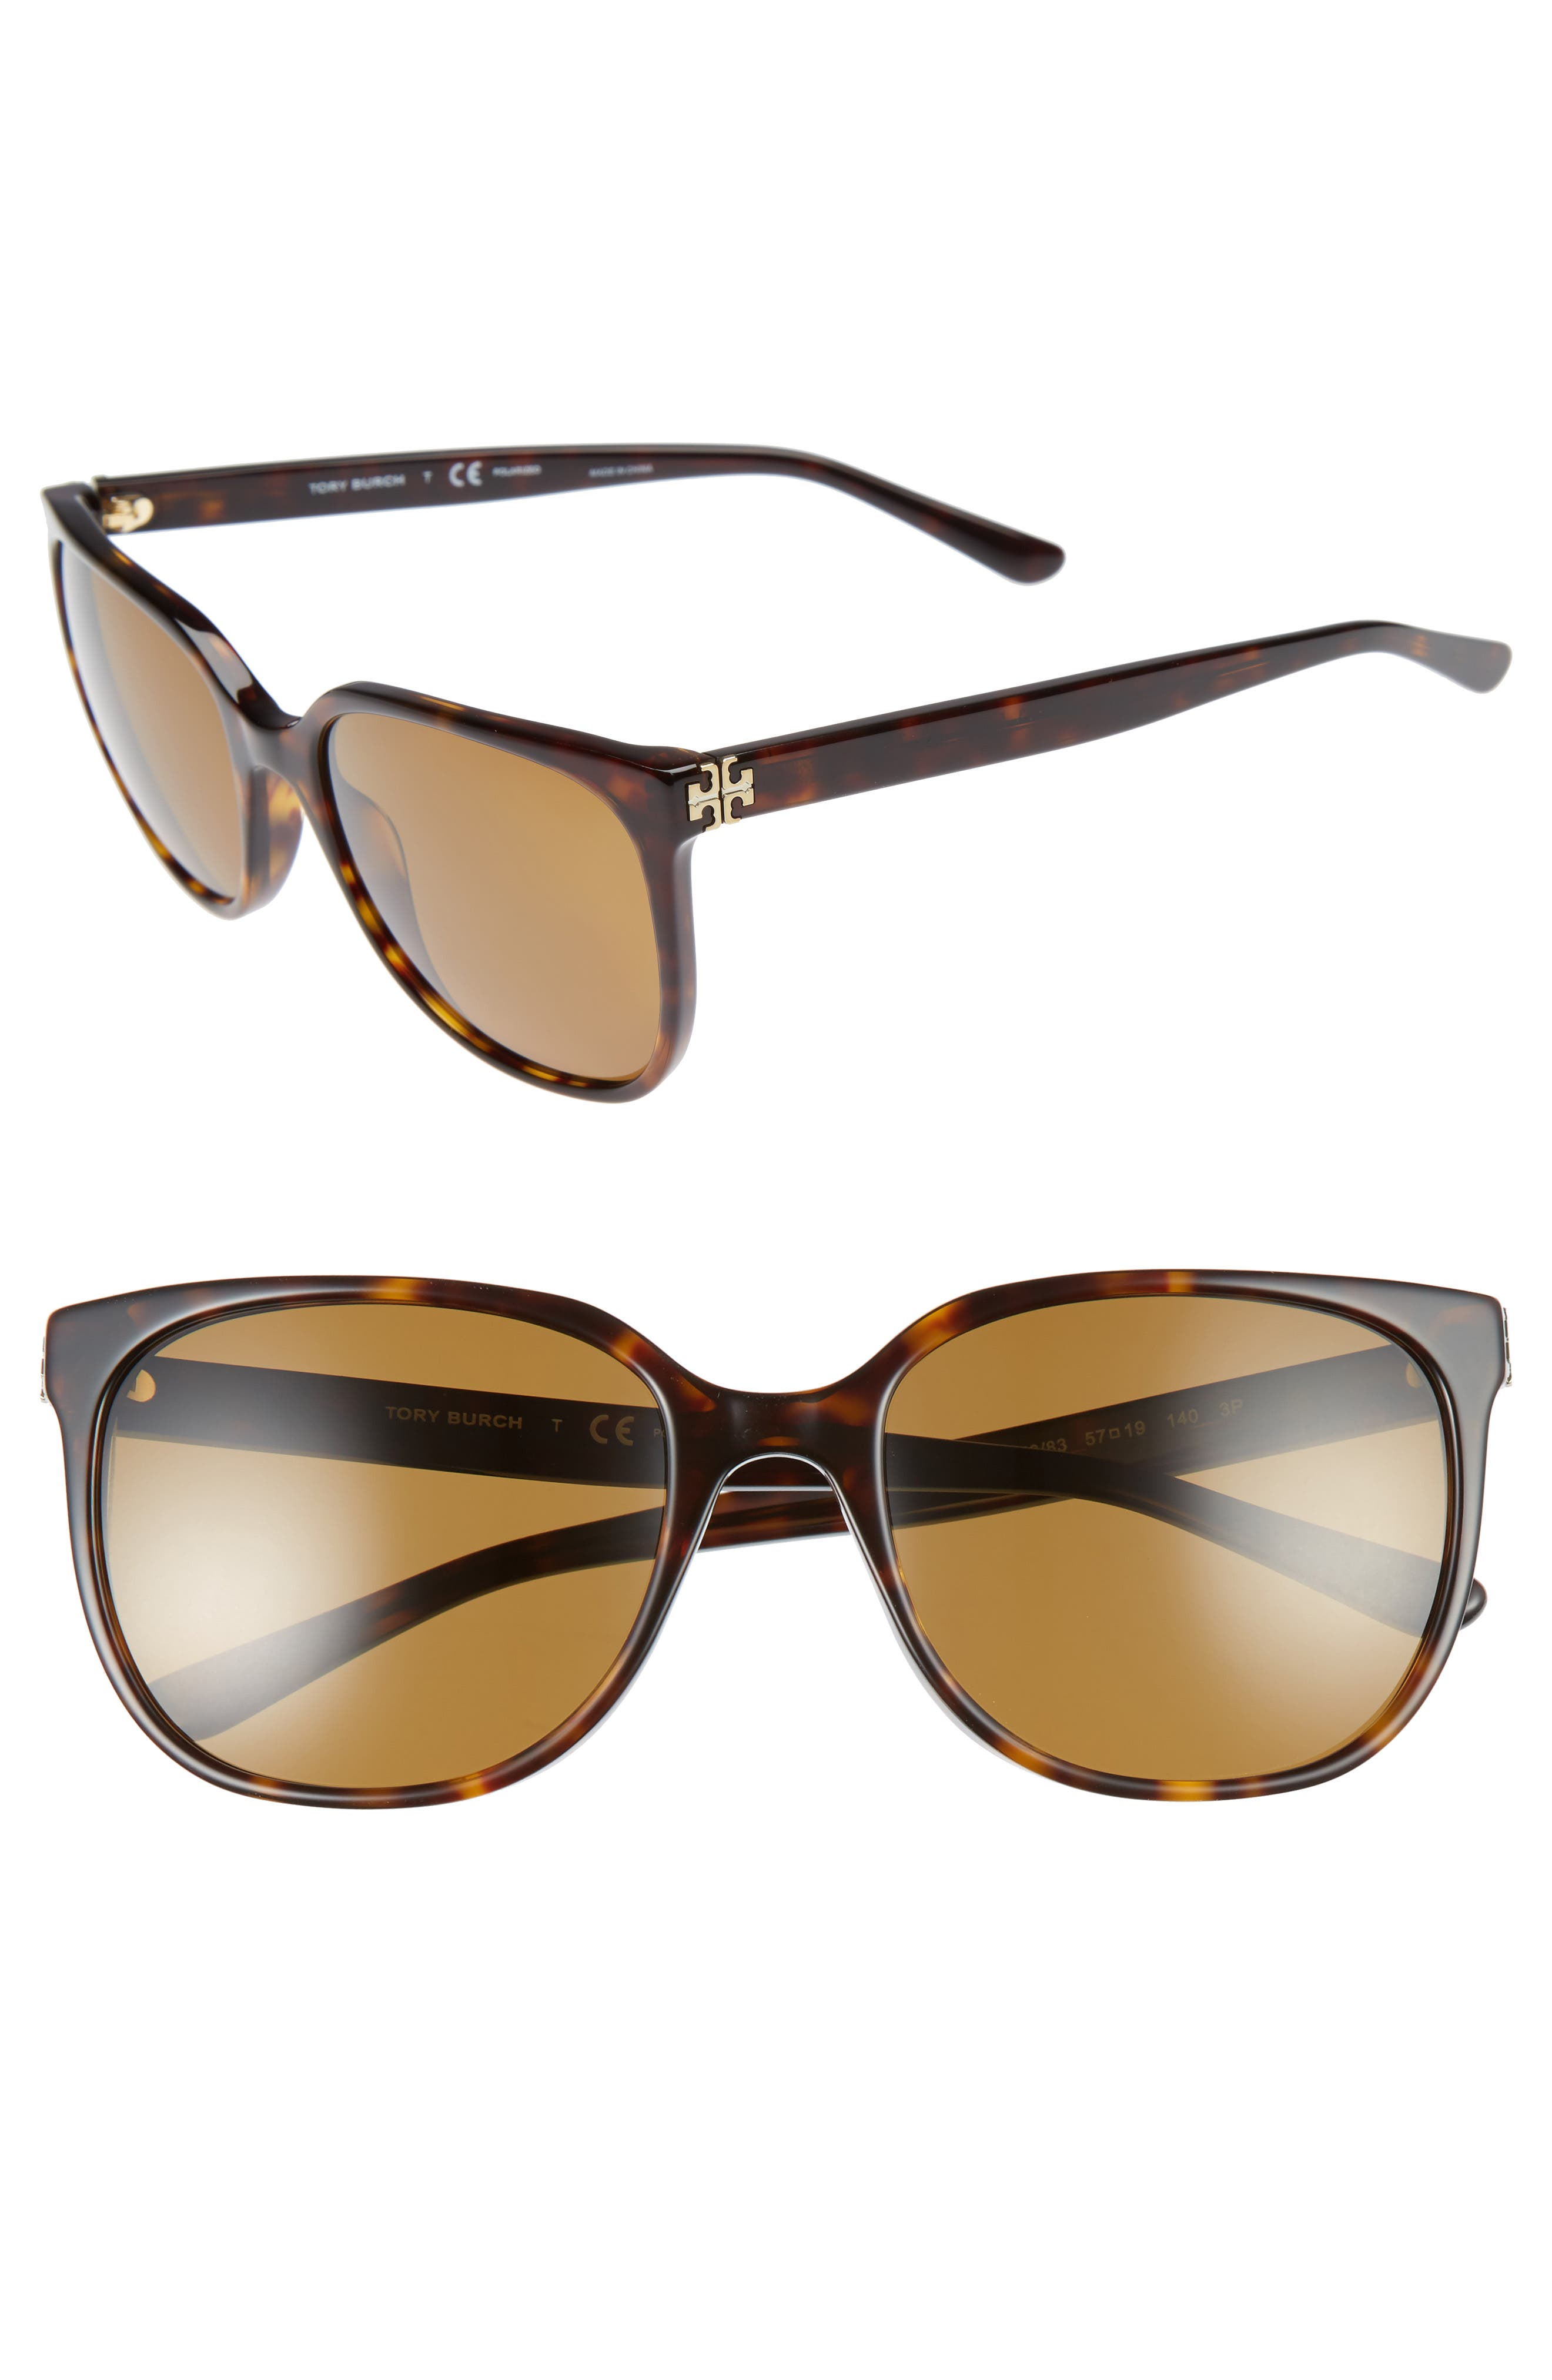 TORY BURCH, 57mm Polarized Sunglasses, Main thumbnail 1, color, 200